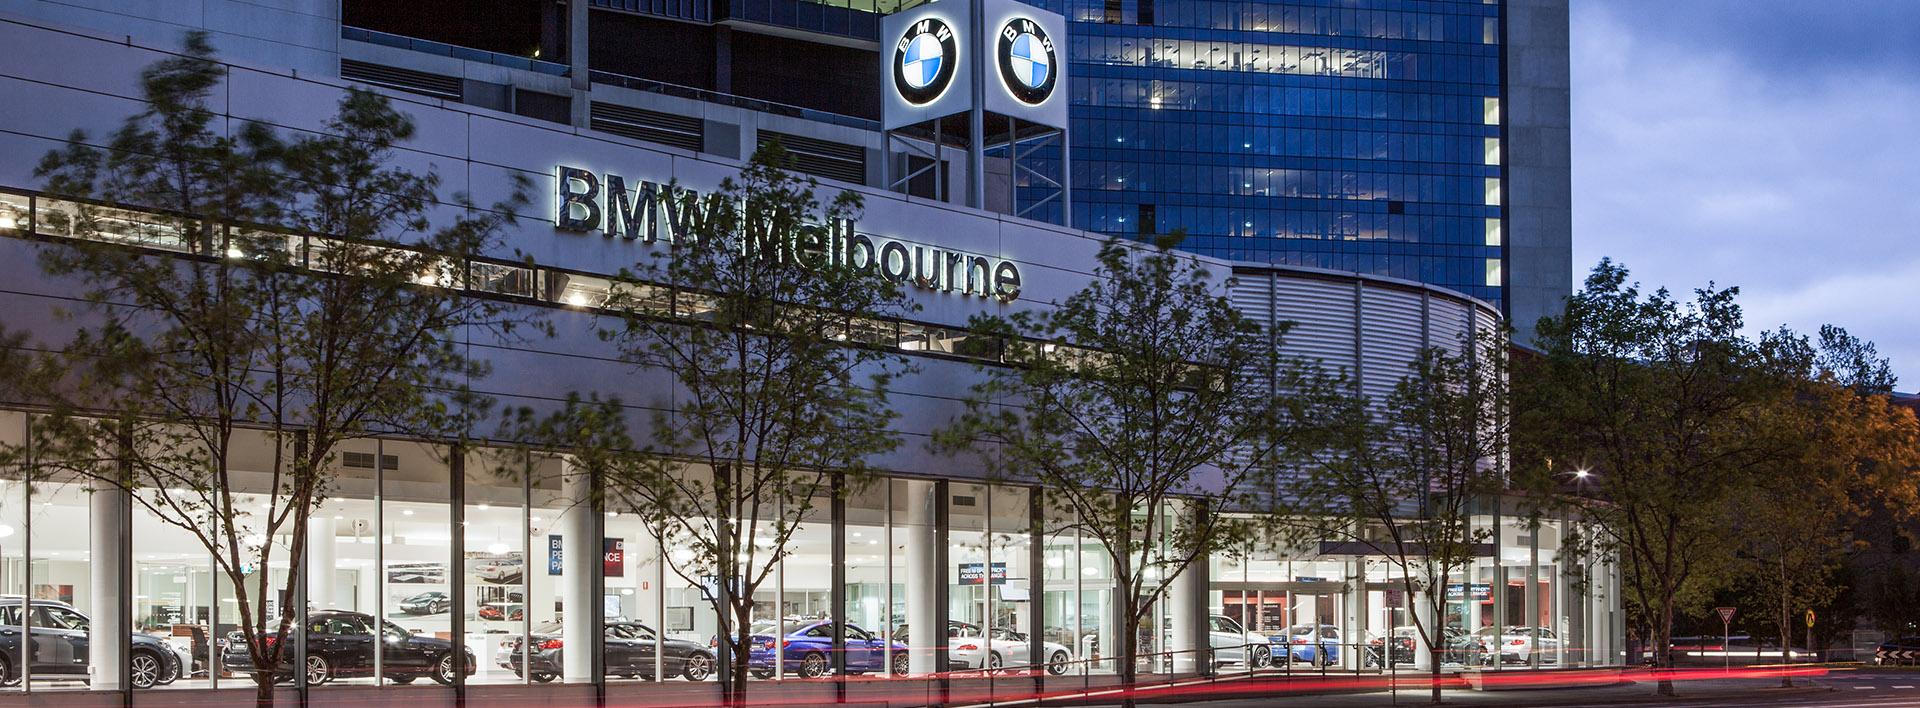 Melbourne BMW - Southbank